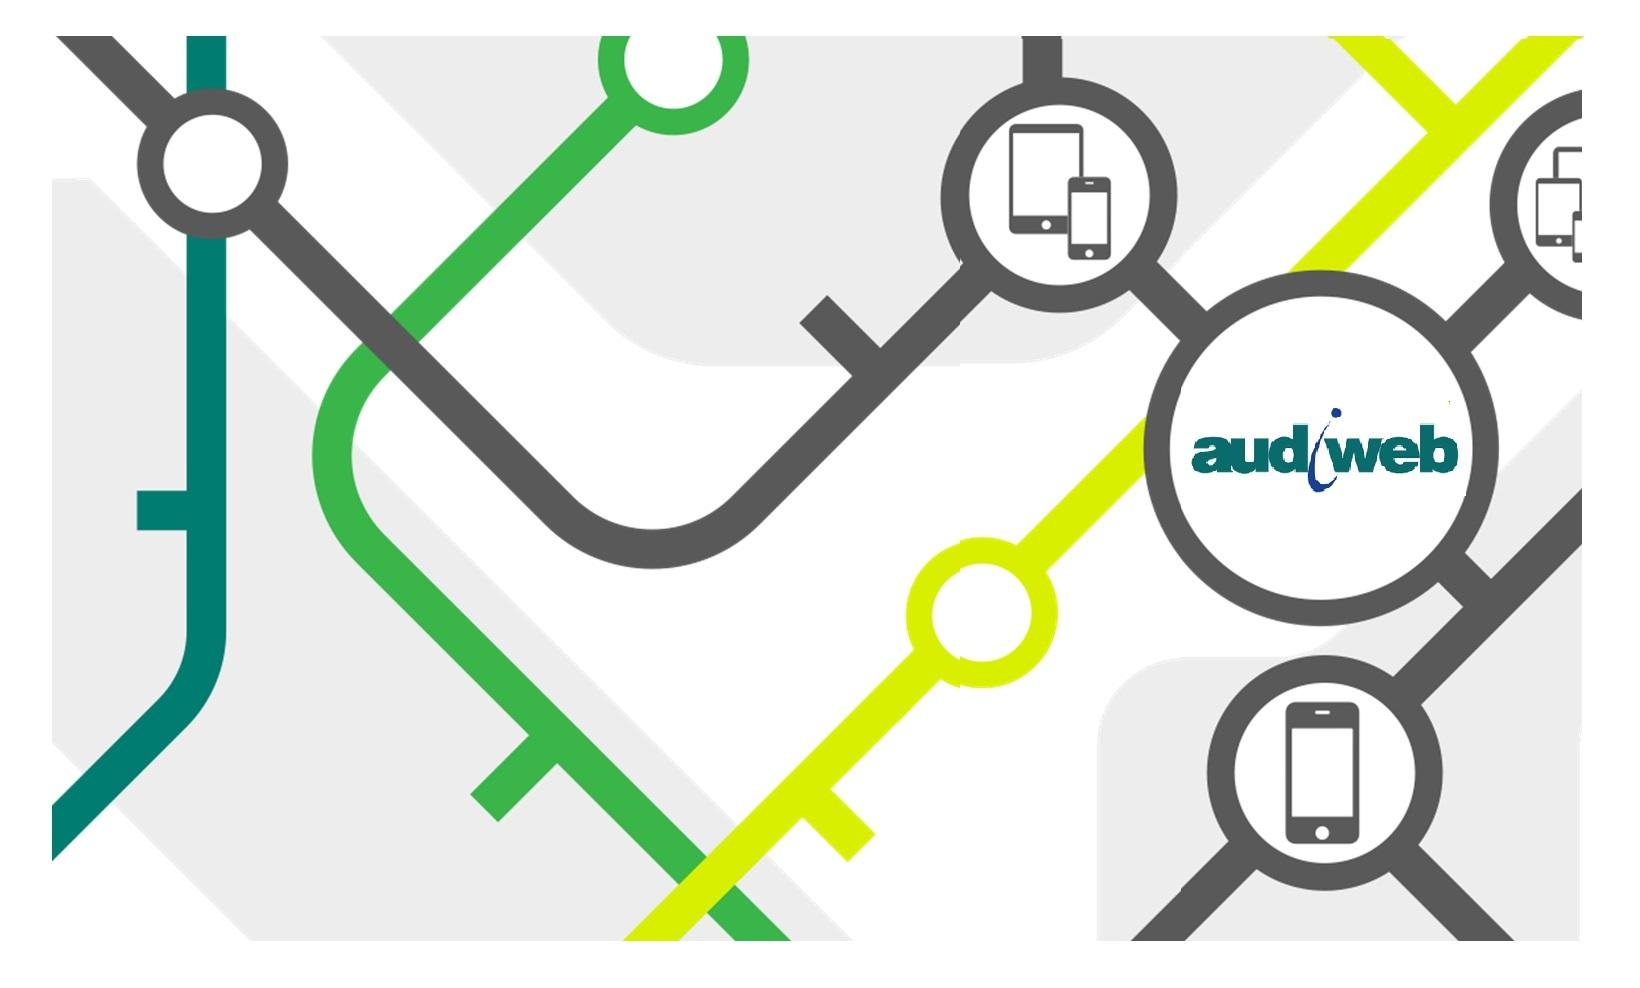 audiweb generica6 - Audiweb Database avvia la nuova metodologia Audiweb 2.0